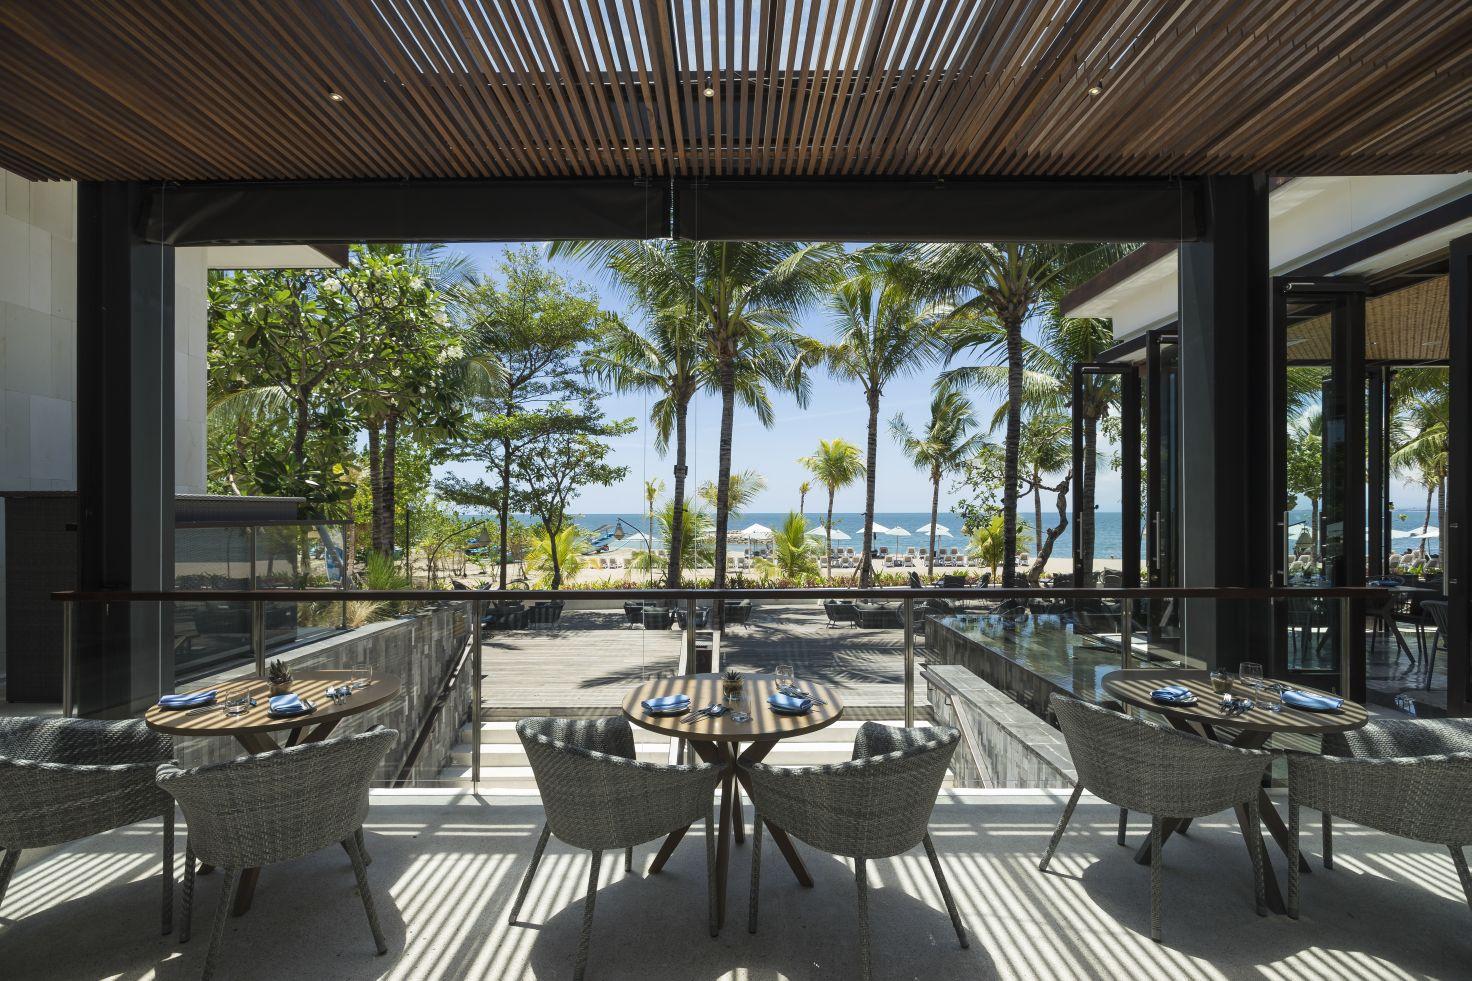 https://highend-traveller.com/retox-and-recharge-at-the-anvaya-beach-resort-bali/